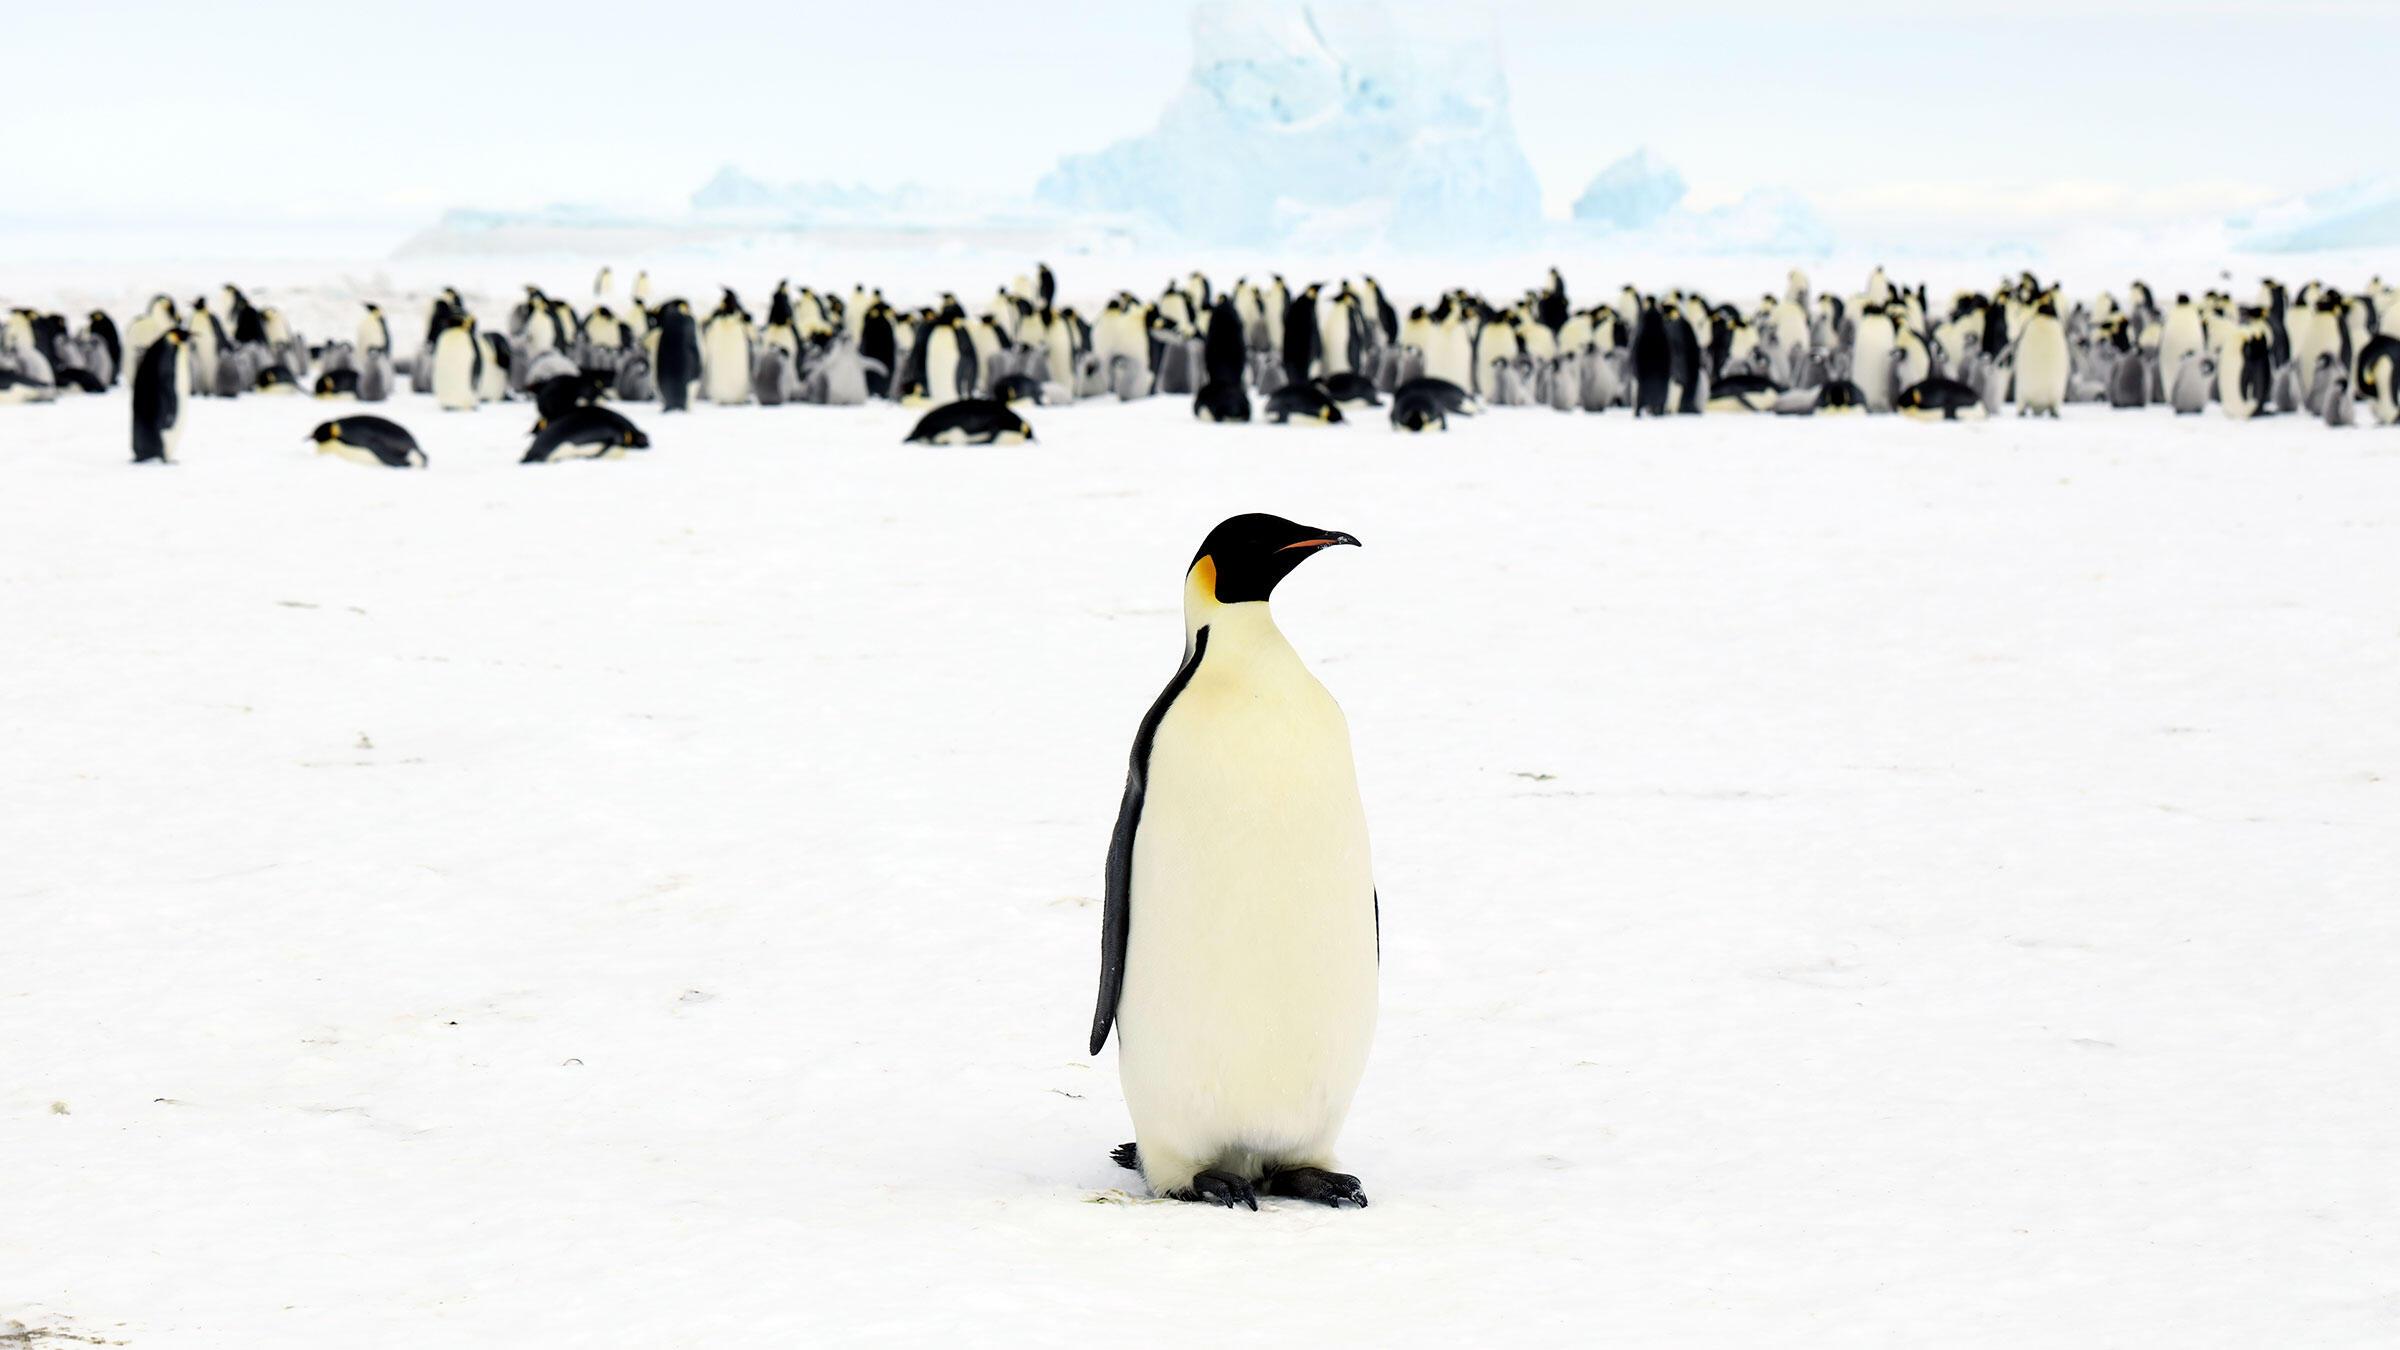 Emperor Penguin. Myeongho Seo/Shutterstock